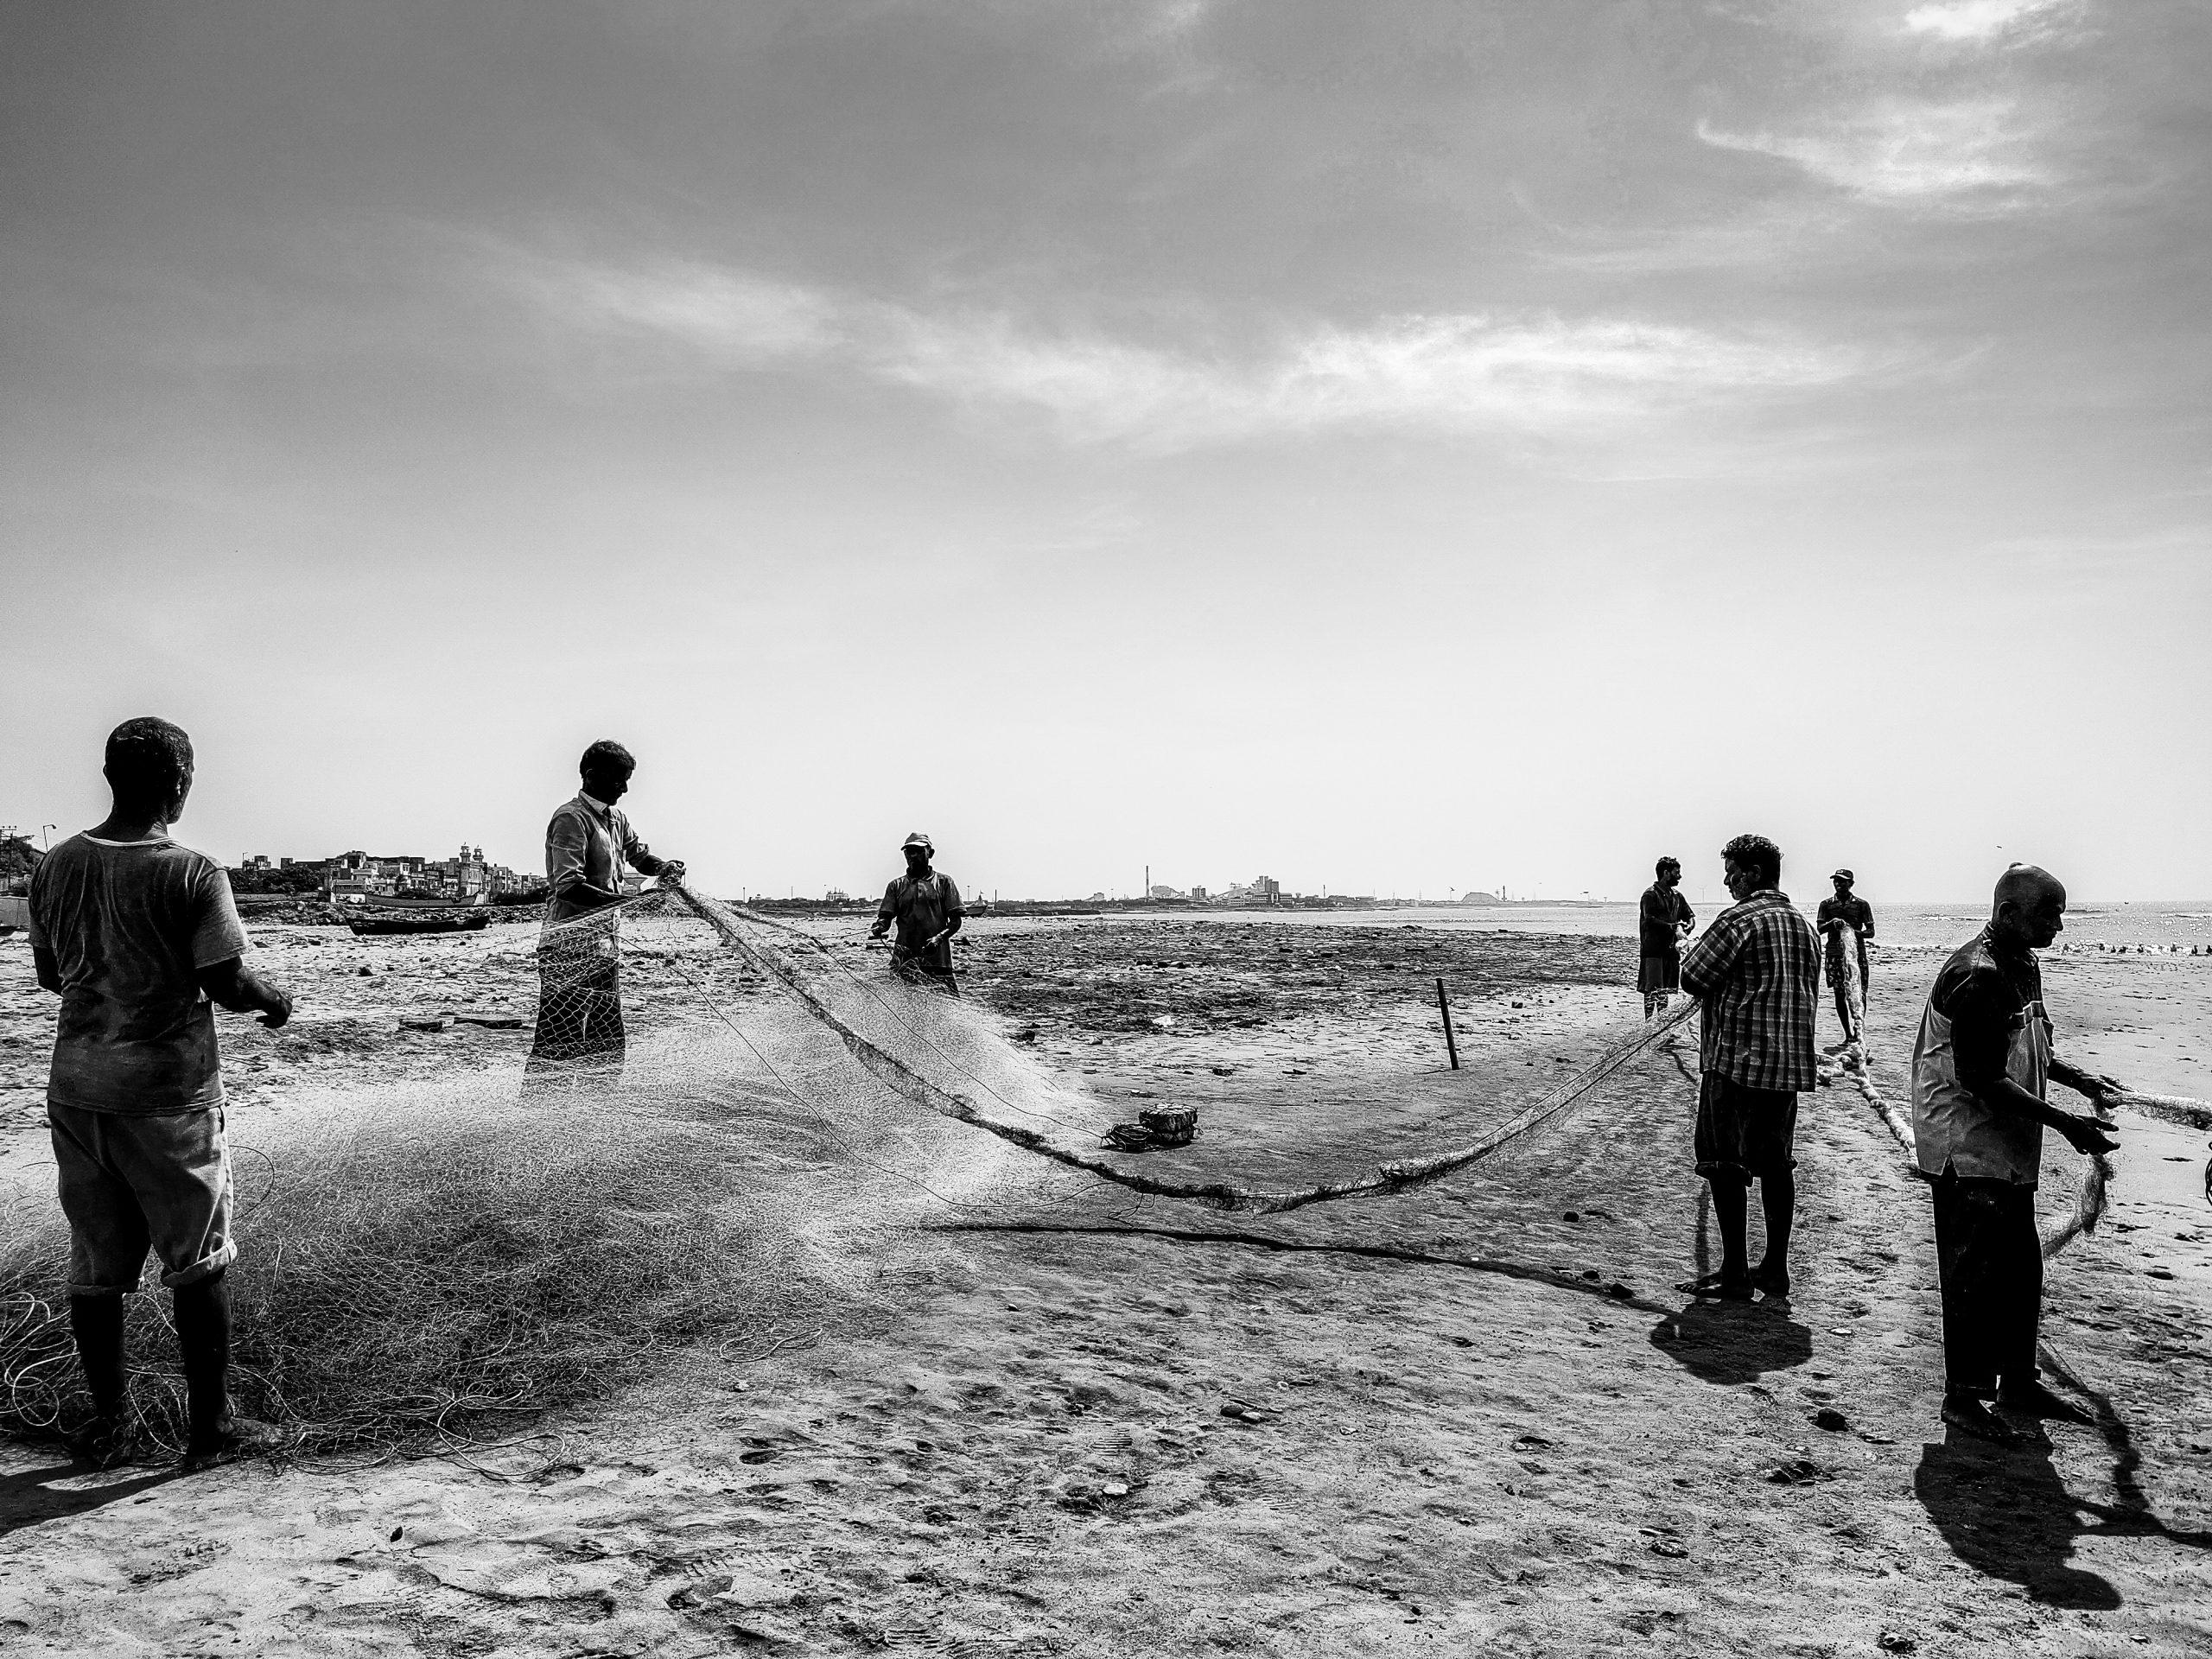 Fishermen with fishing net on a beach